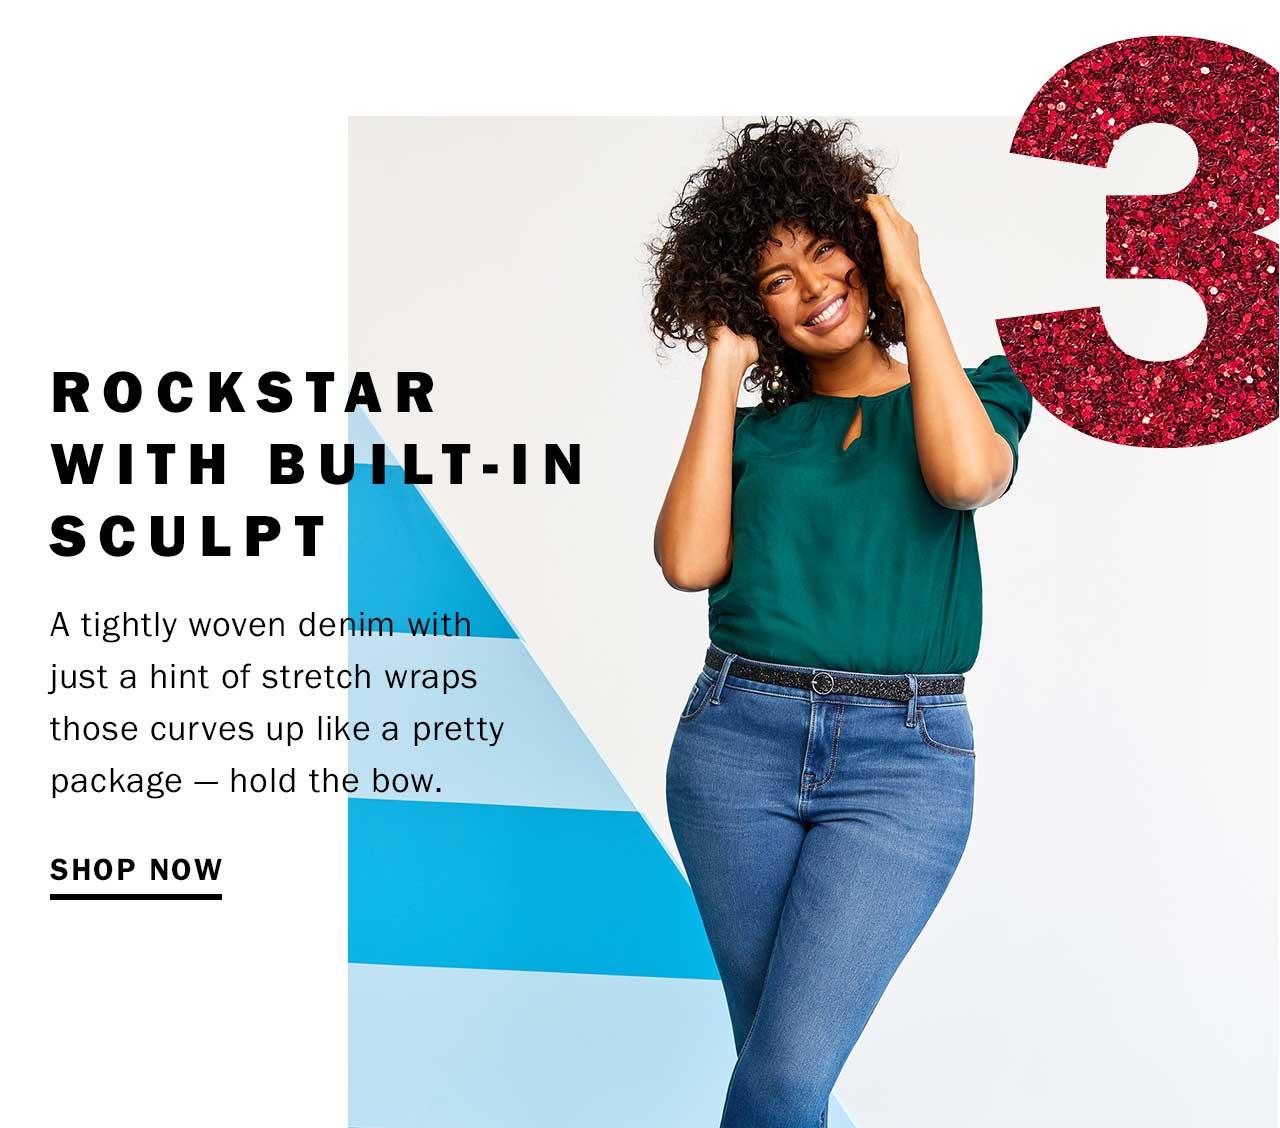 Rockstar with built-in sculpt